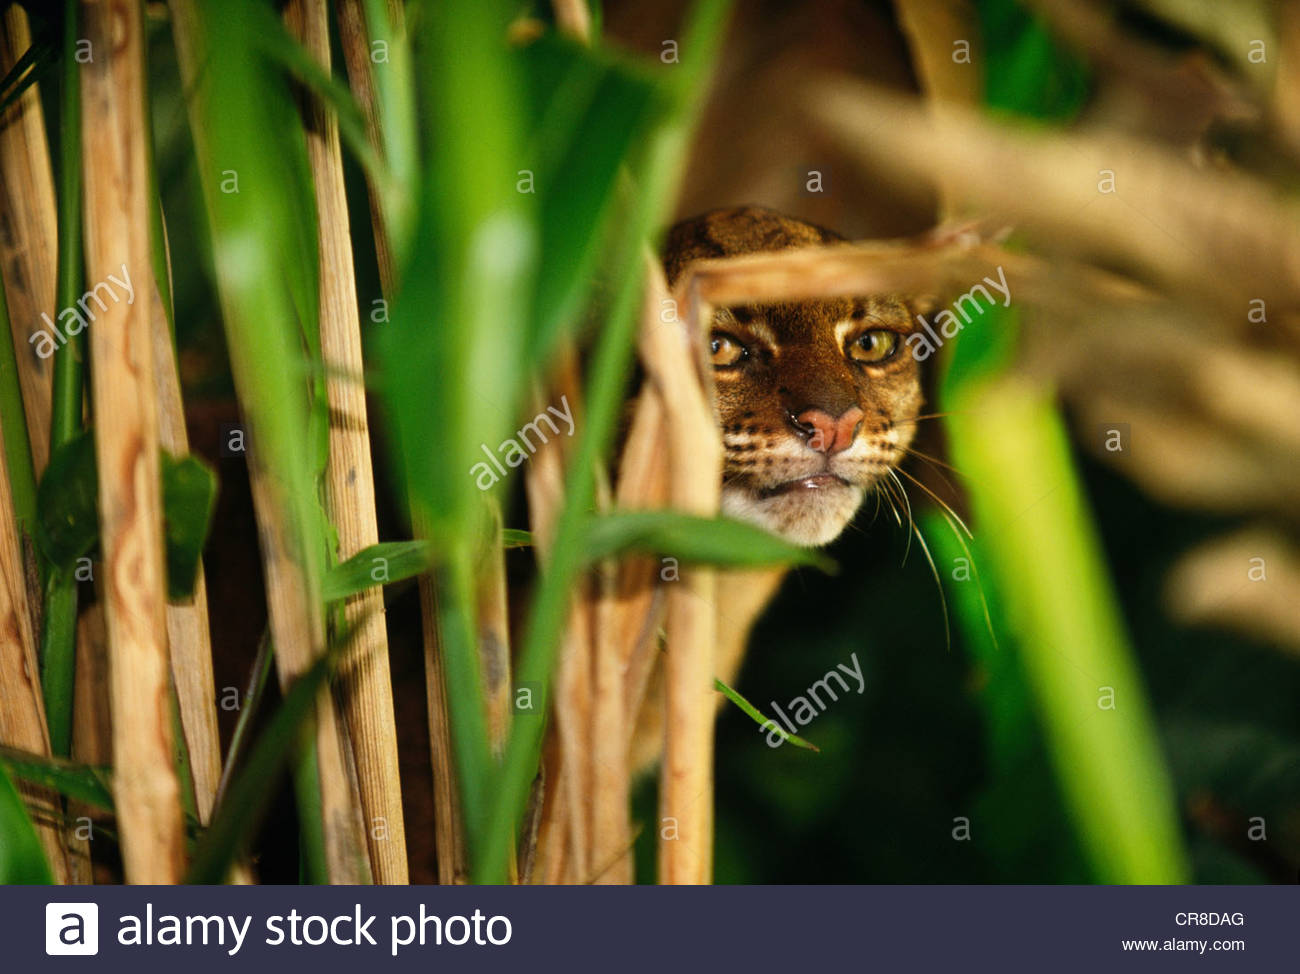 Bornean red or bay cat, Borneo, Indonesia - Stock Image